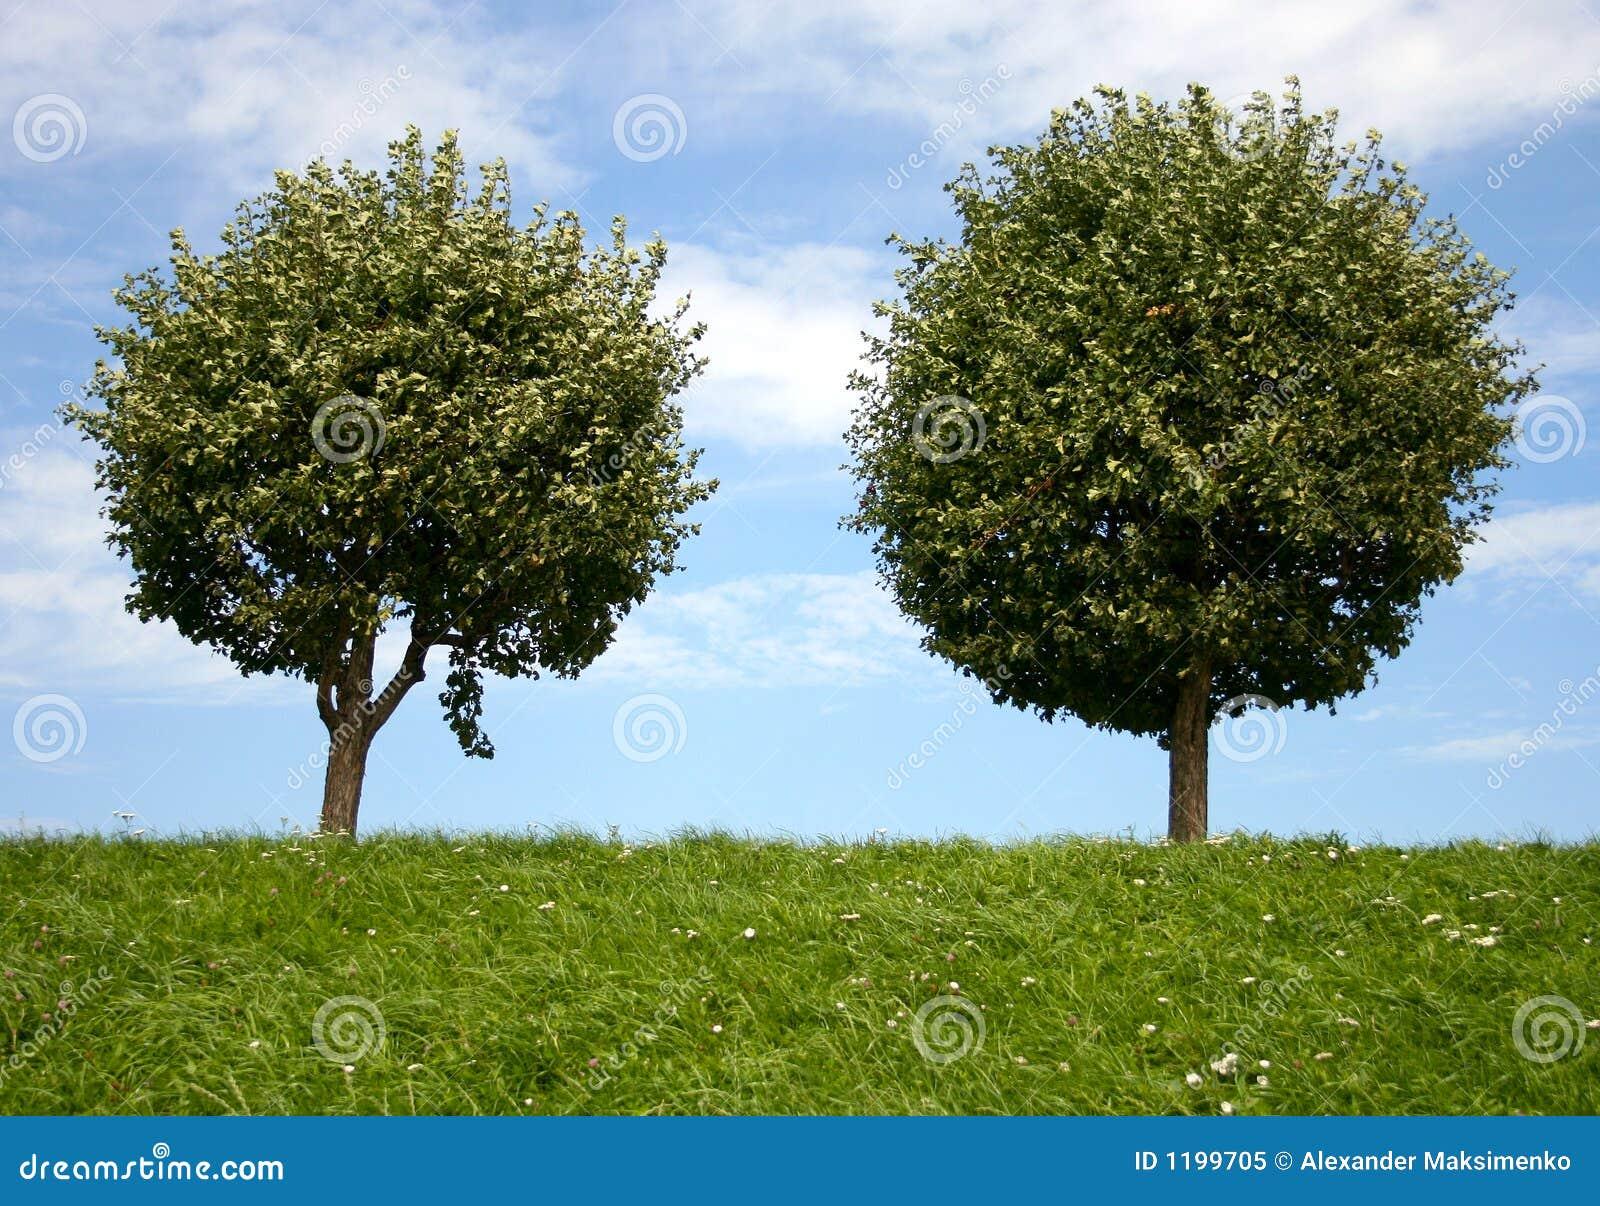 dos  u00e1rboles redondos imagen de archivo imagen de vector trees illustrator vector trees plan